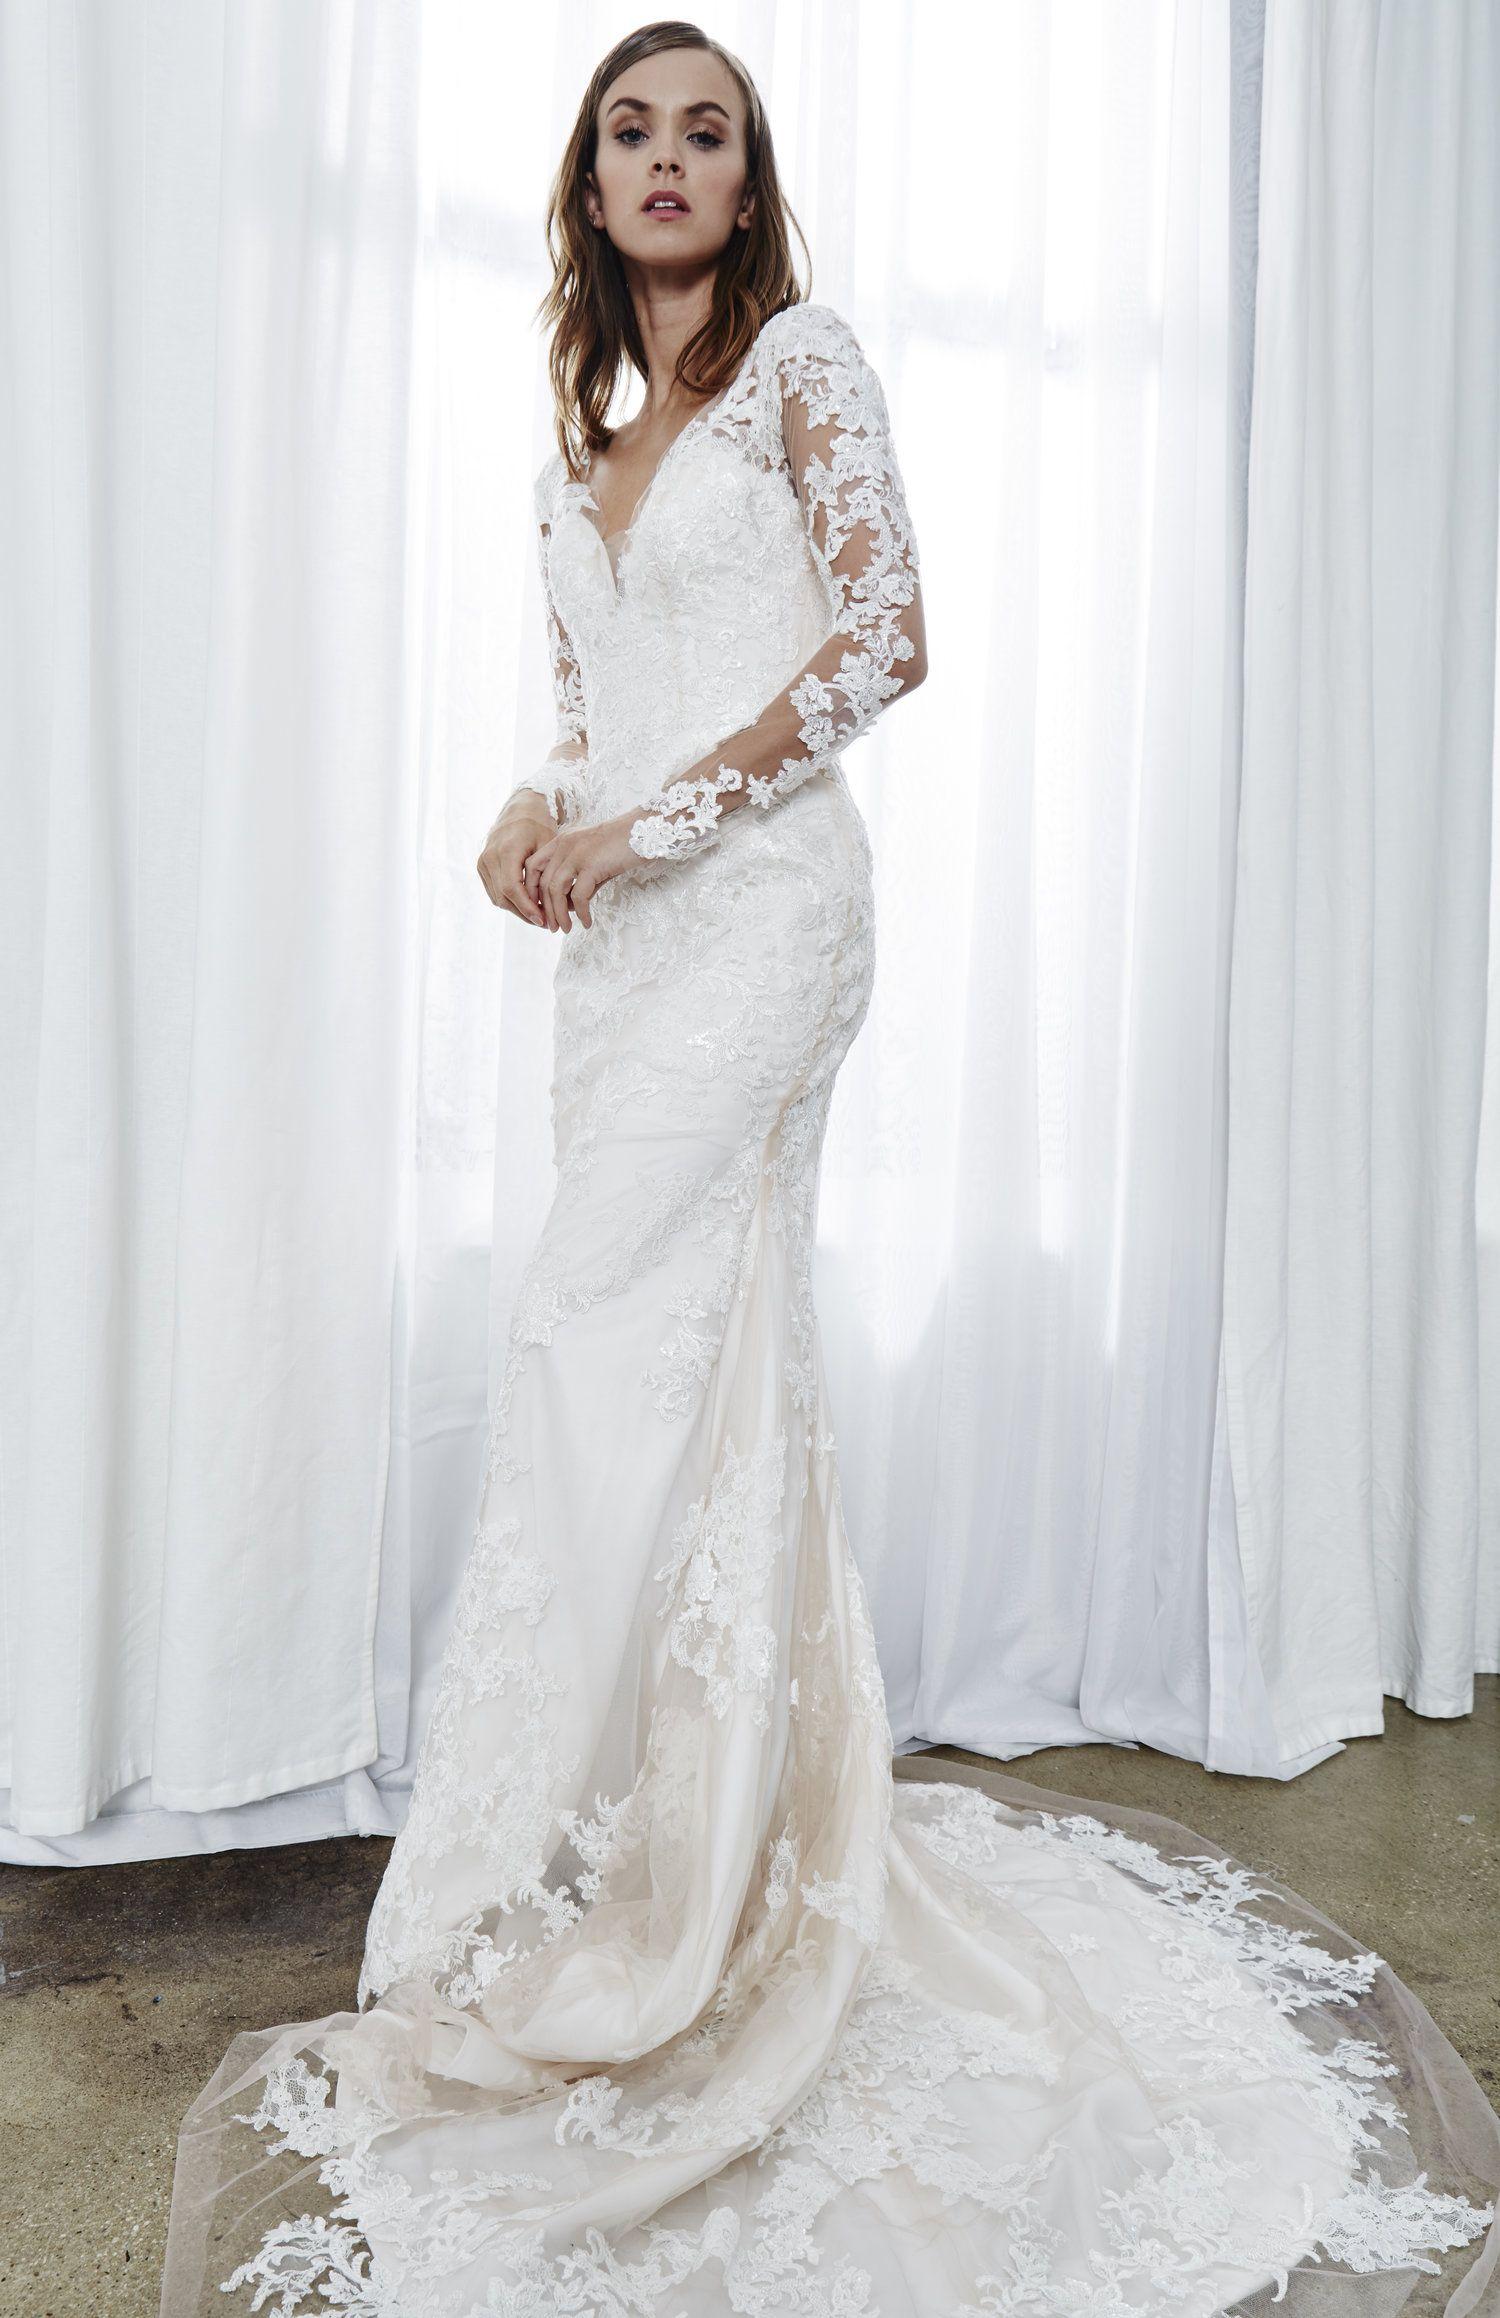 Elisa Kelly Faetanini Fitted Wedding Dress Fit And Flare Wedding Dress Wedding Dress Long Sleeve